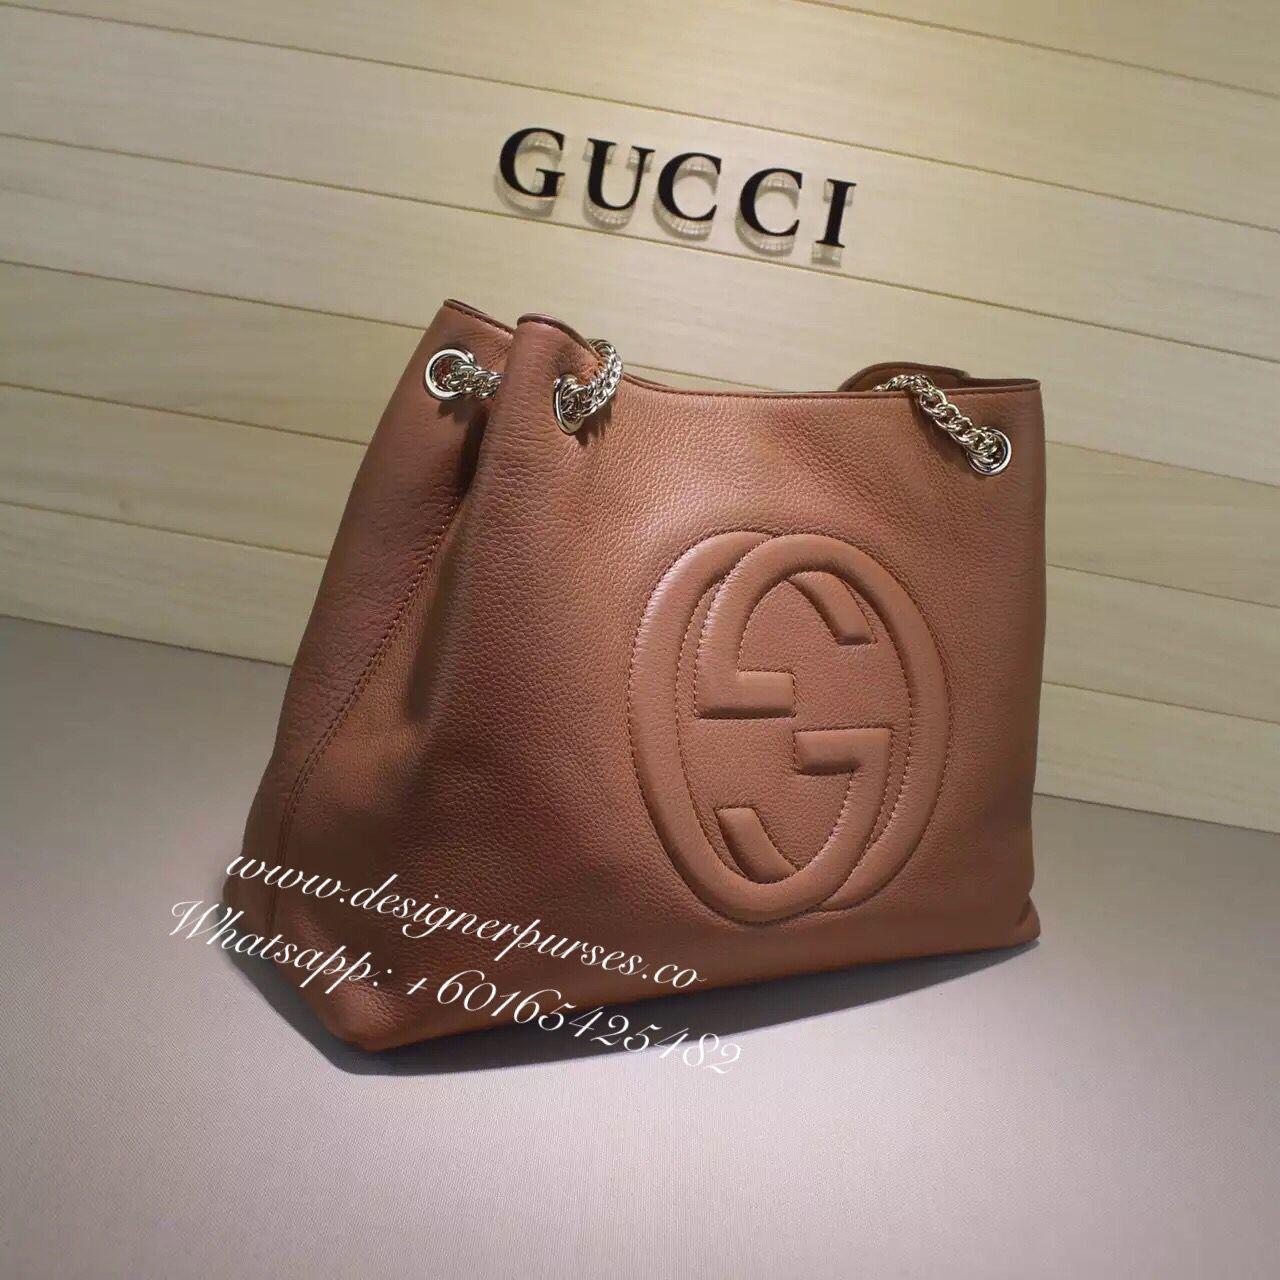 840ed8ecf133 We have Brown now~~~ Gucci soho leather shoulder chain bagOrder  +60165425482 email  designerpursesco gmail.com mybrandcity gmail.com